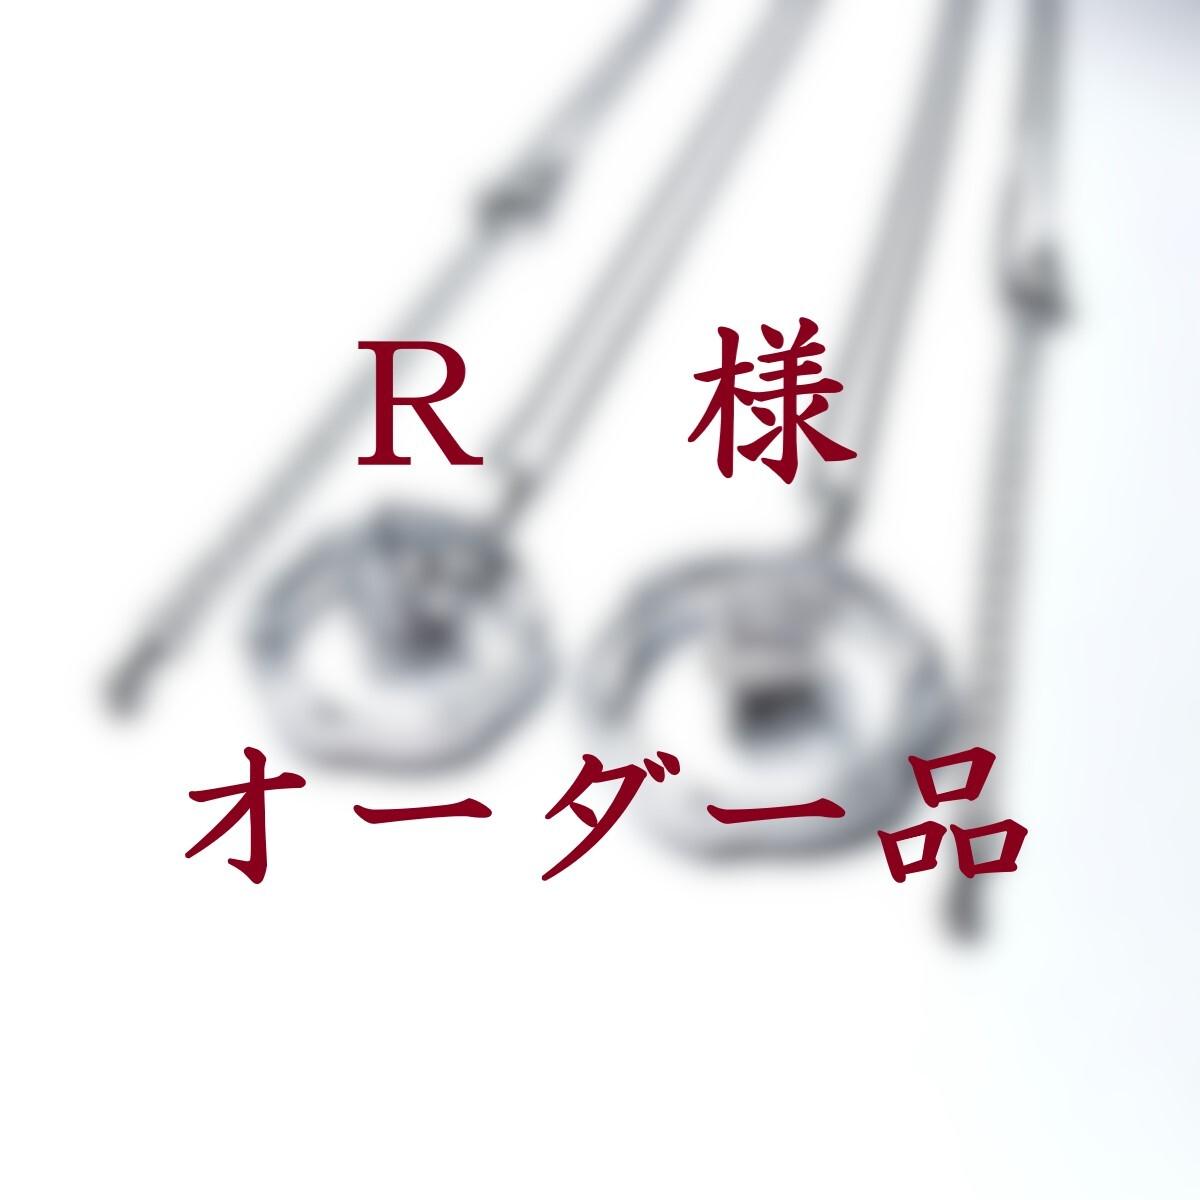 ☆R様オーダー品☆ (ネックレス)